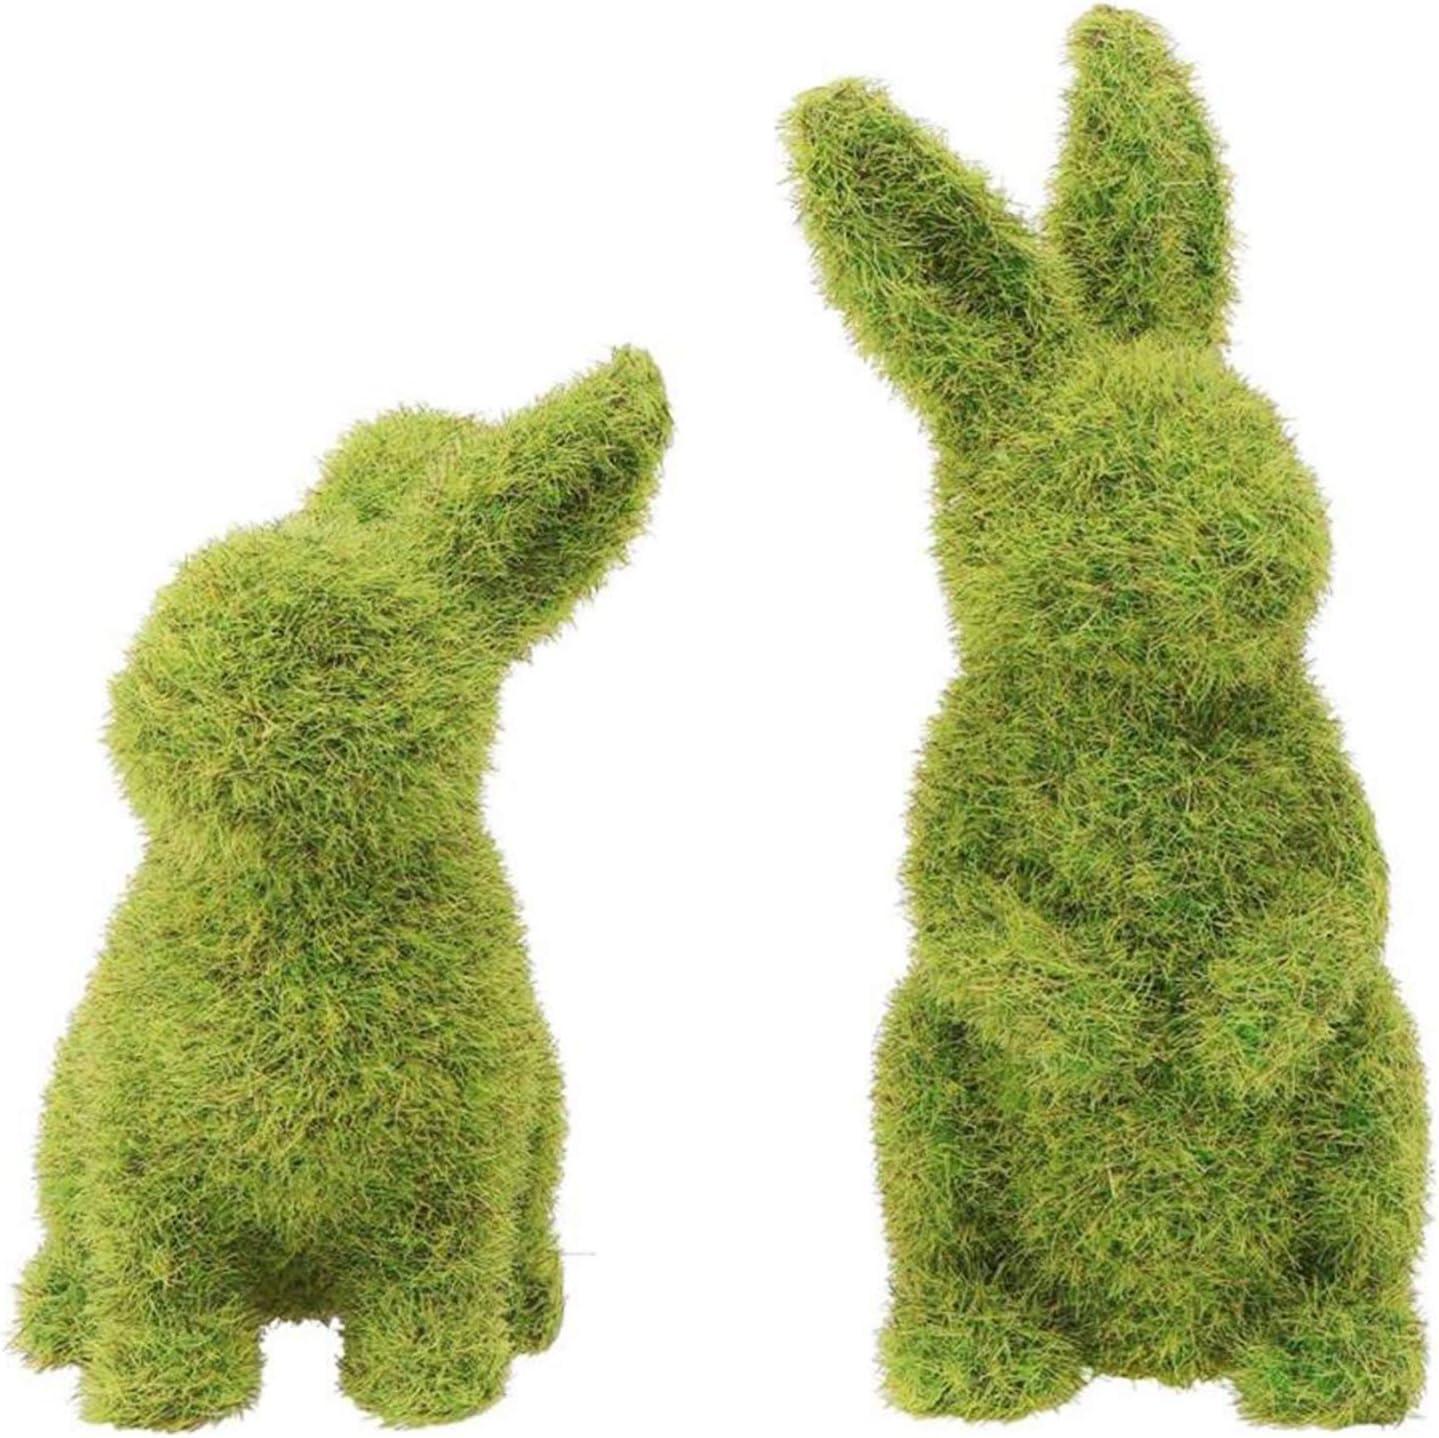 QWDLID 2 Pieces Easter Bunny Craft Set Green Resin Moss Crafts Garden Ornamental Rabbit Crafts Easter Decors for Potting, Hallway, Desktop,Yard